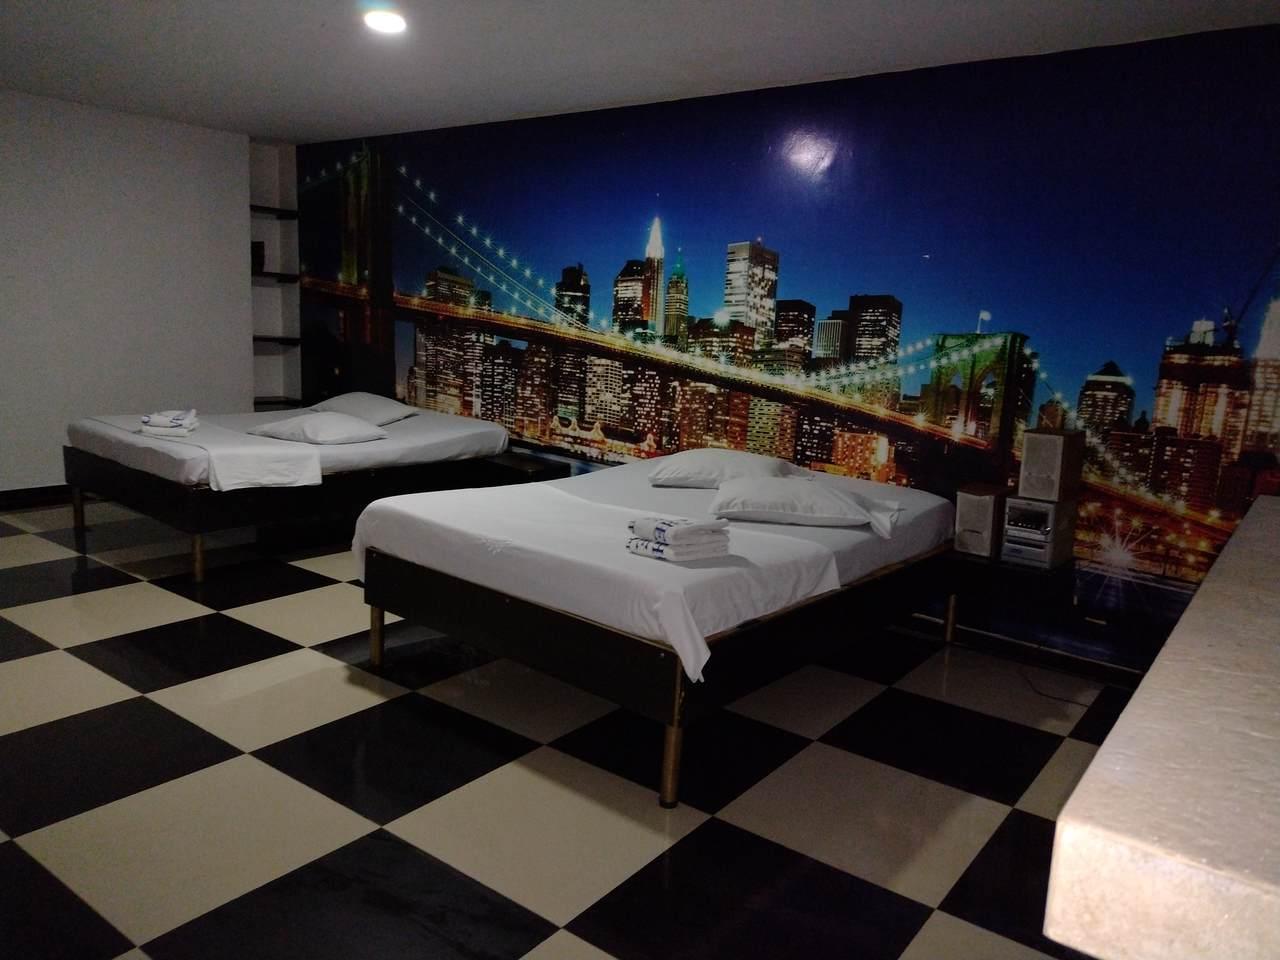 Habitación Habitación Múltiple en Noches de Aventura  : MotelNow